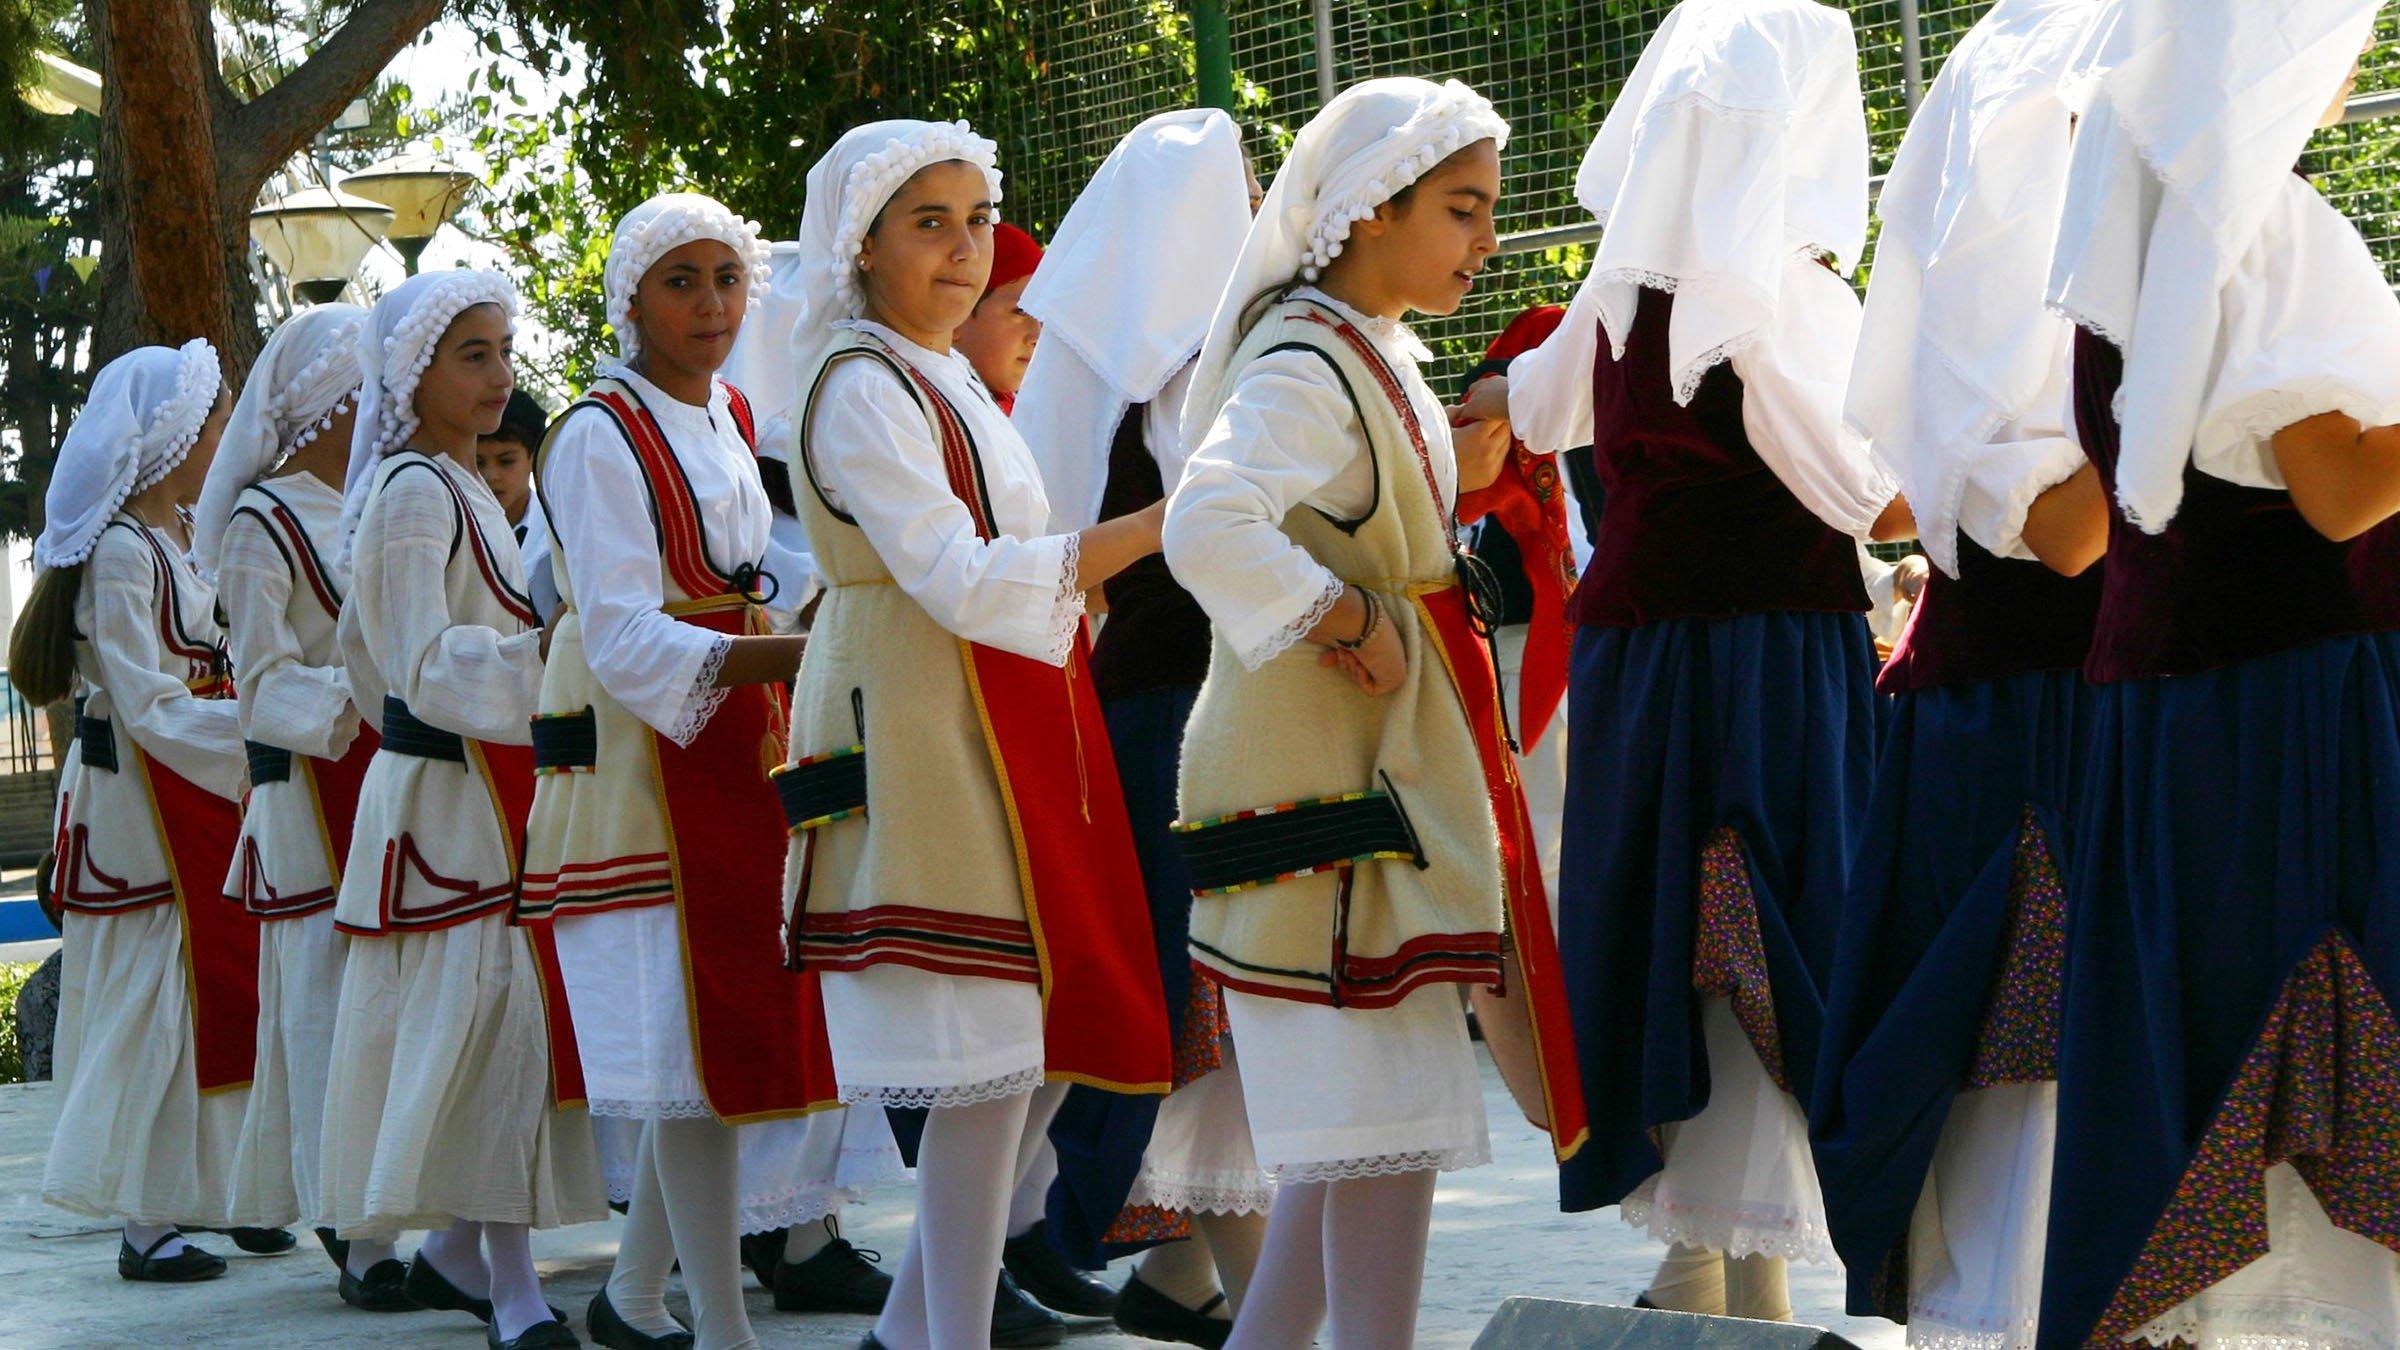 Danza tradicional de chipre for Costumbres de grecia